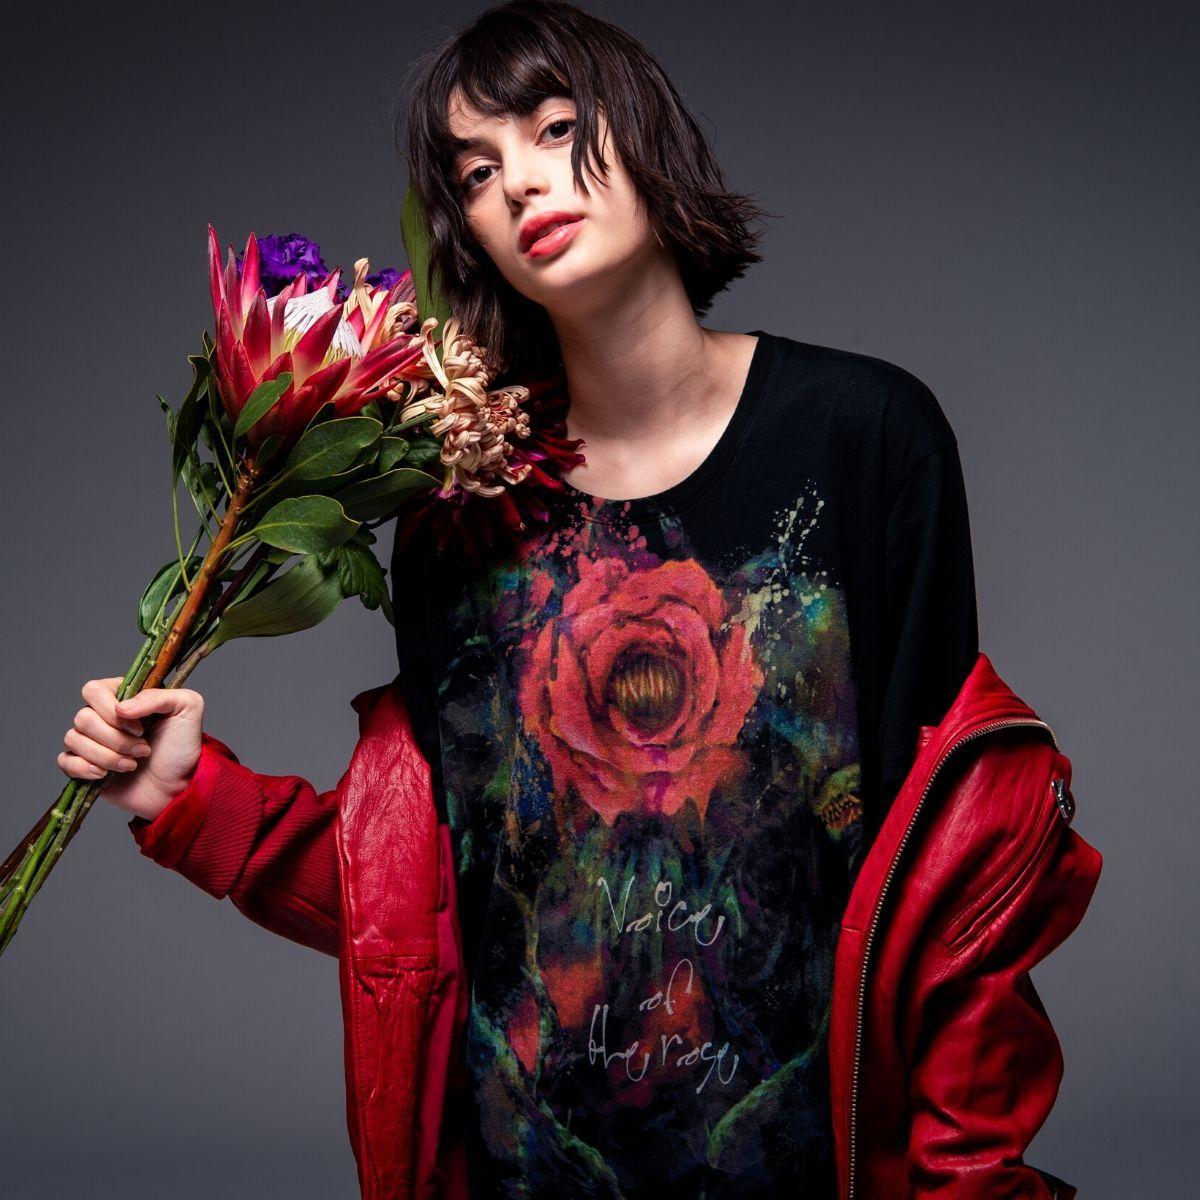 T-shirt—Godzilla/glamb Collaboration